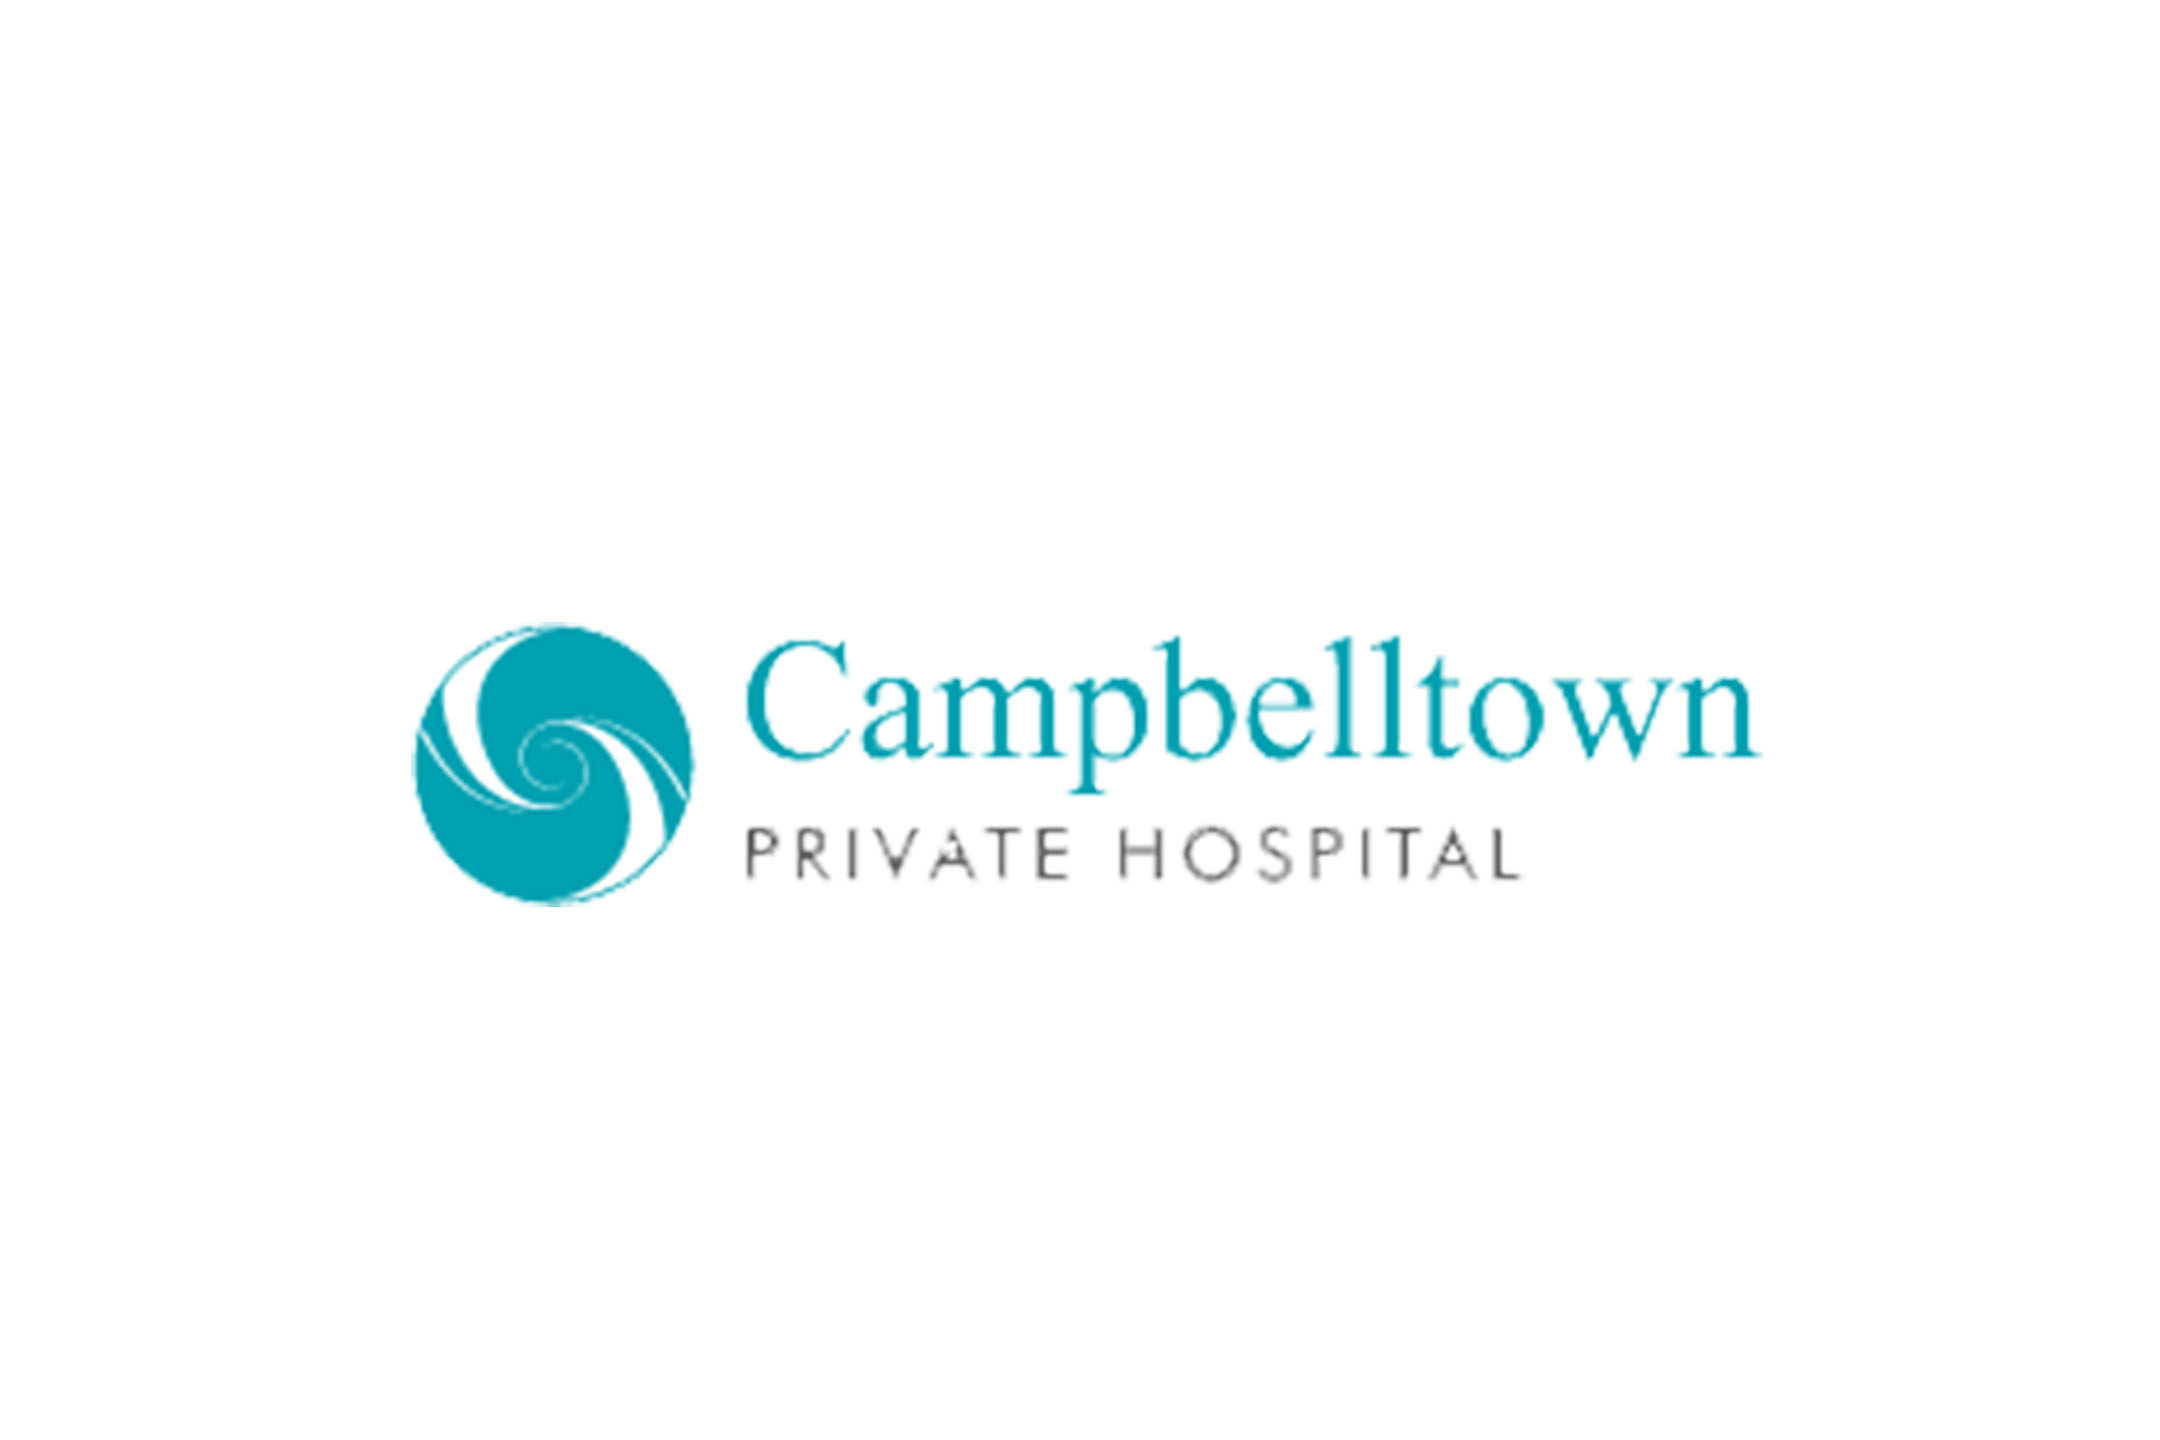 Partnership LogoCampbelltown Private Hospital.jpg